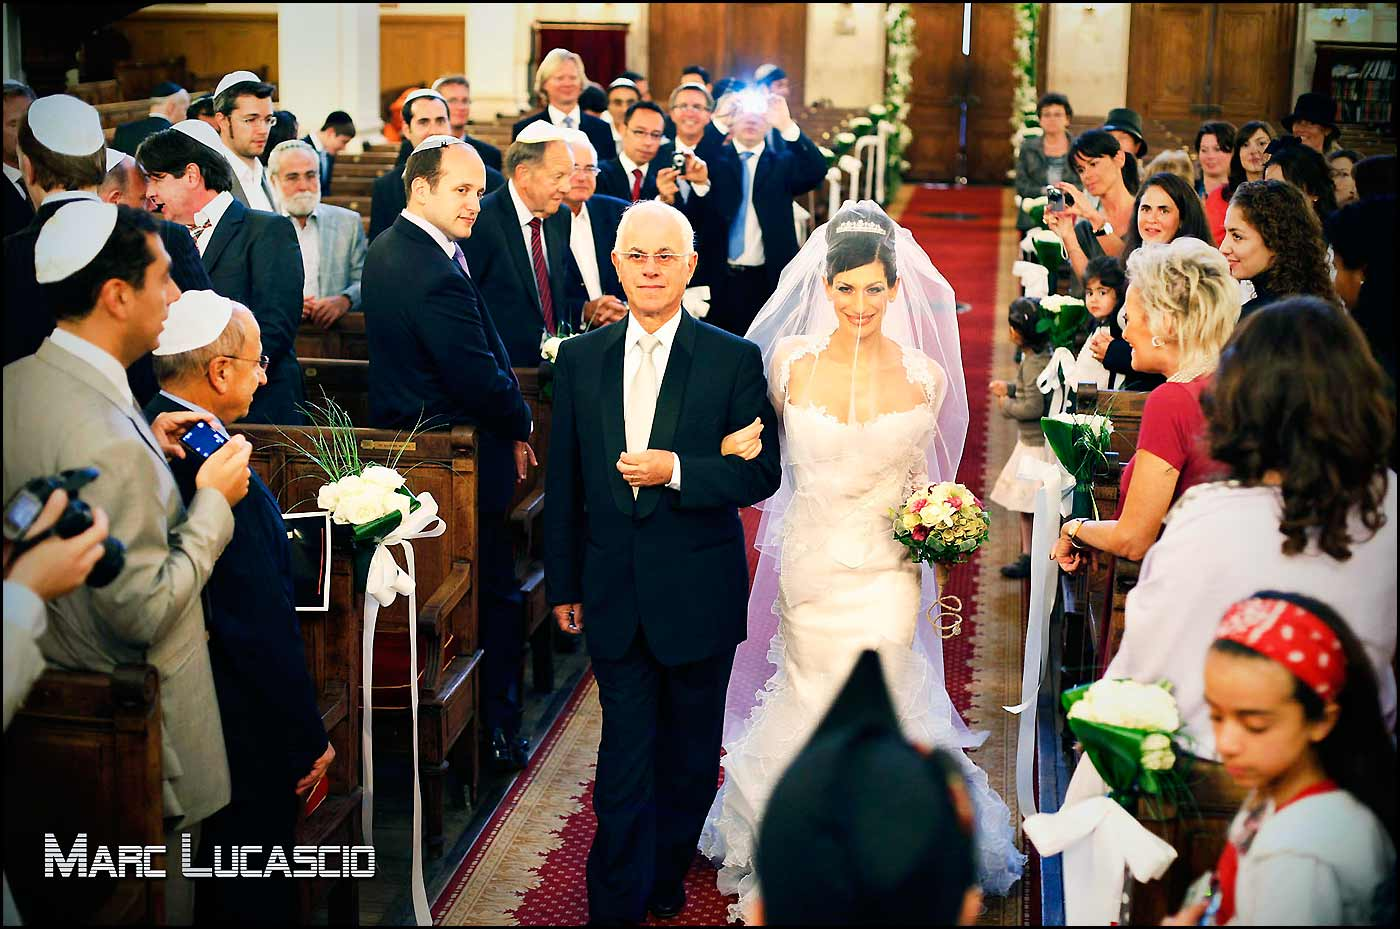 mariage juif dans la synagogue